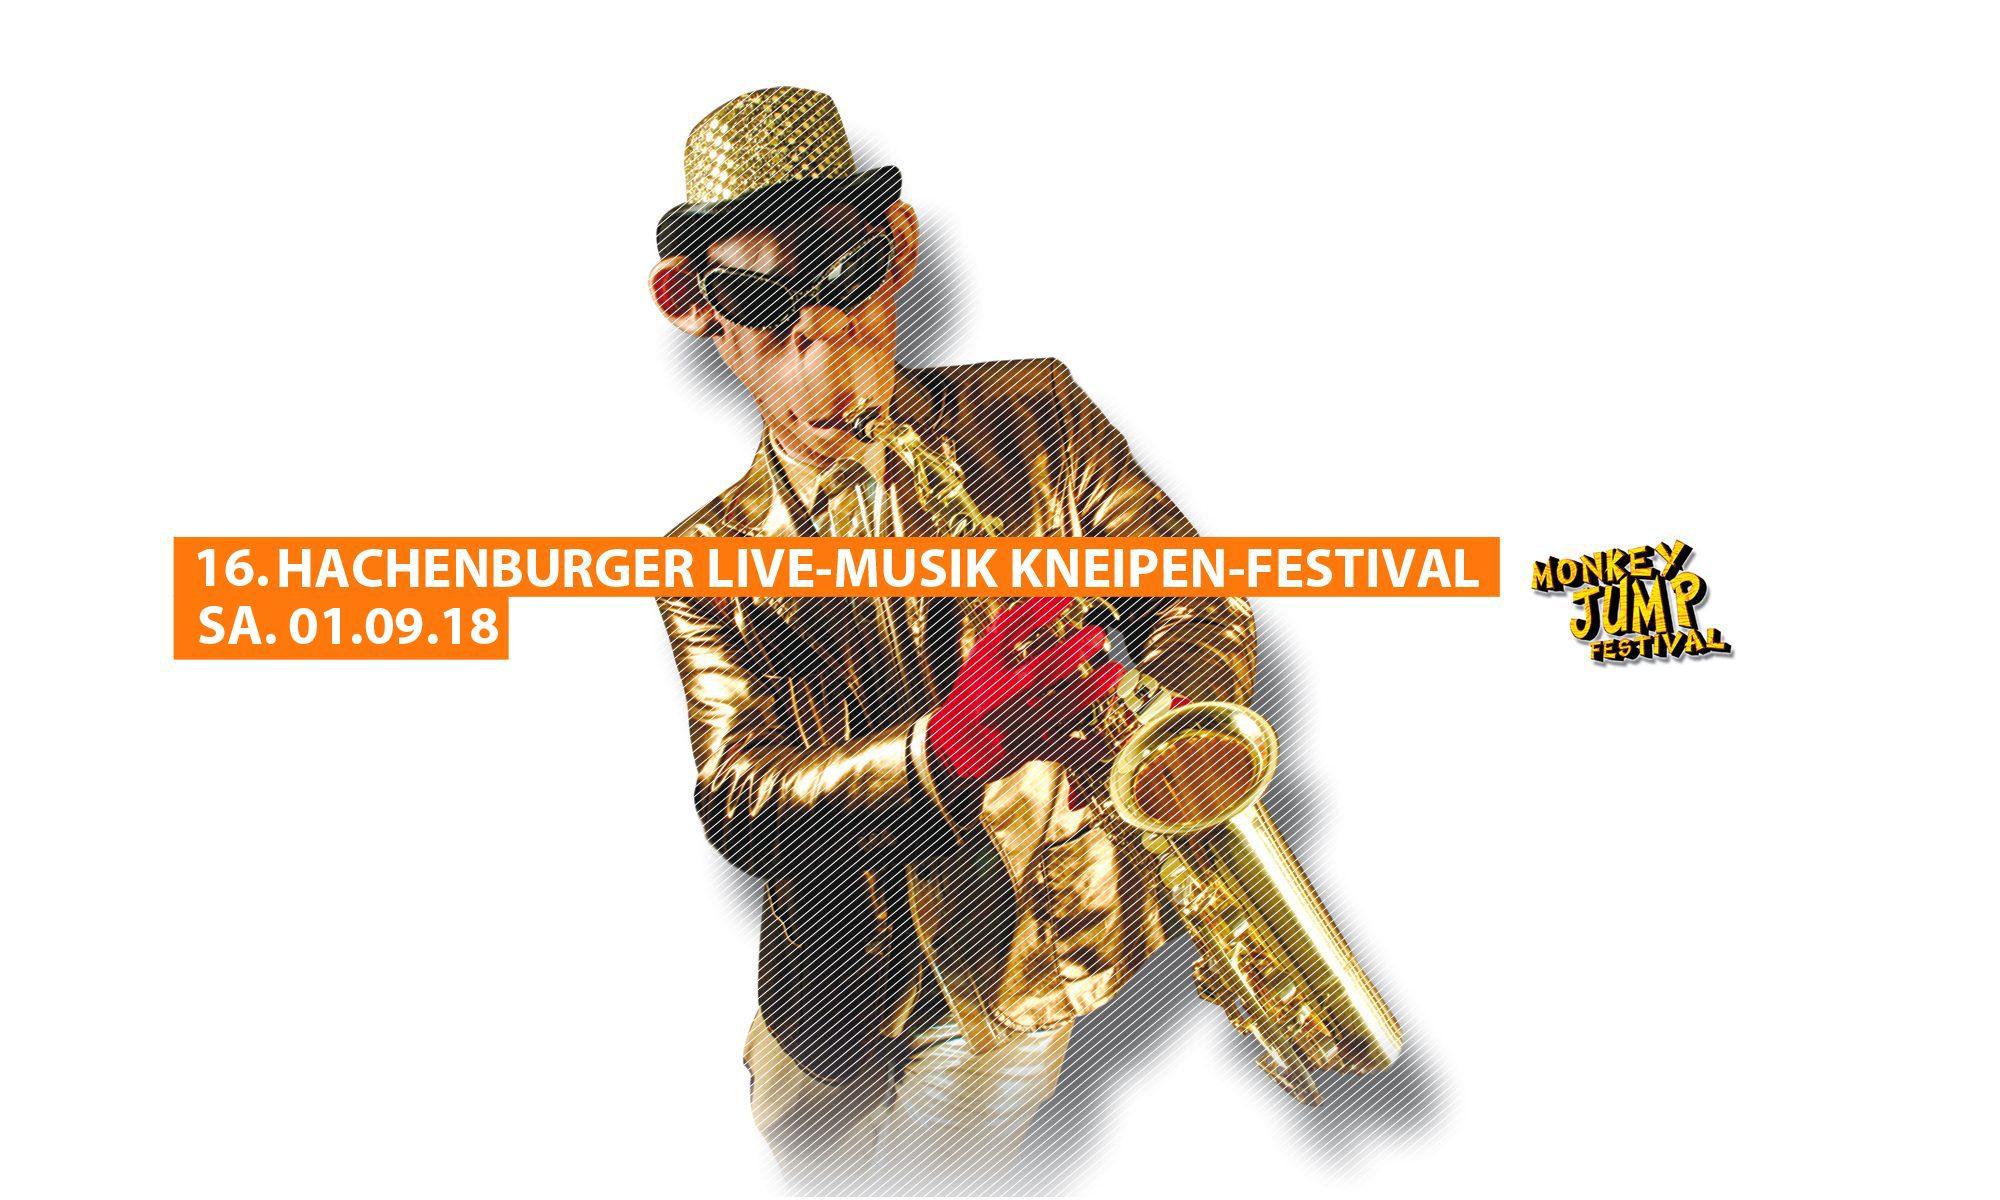 16. Monkey Jump Festival Hachenburg